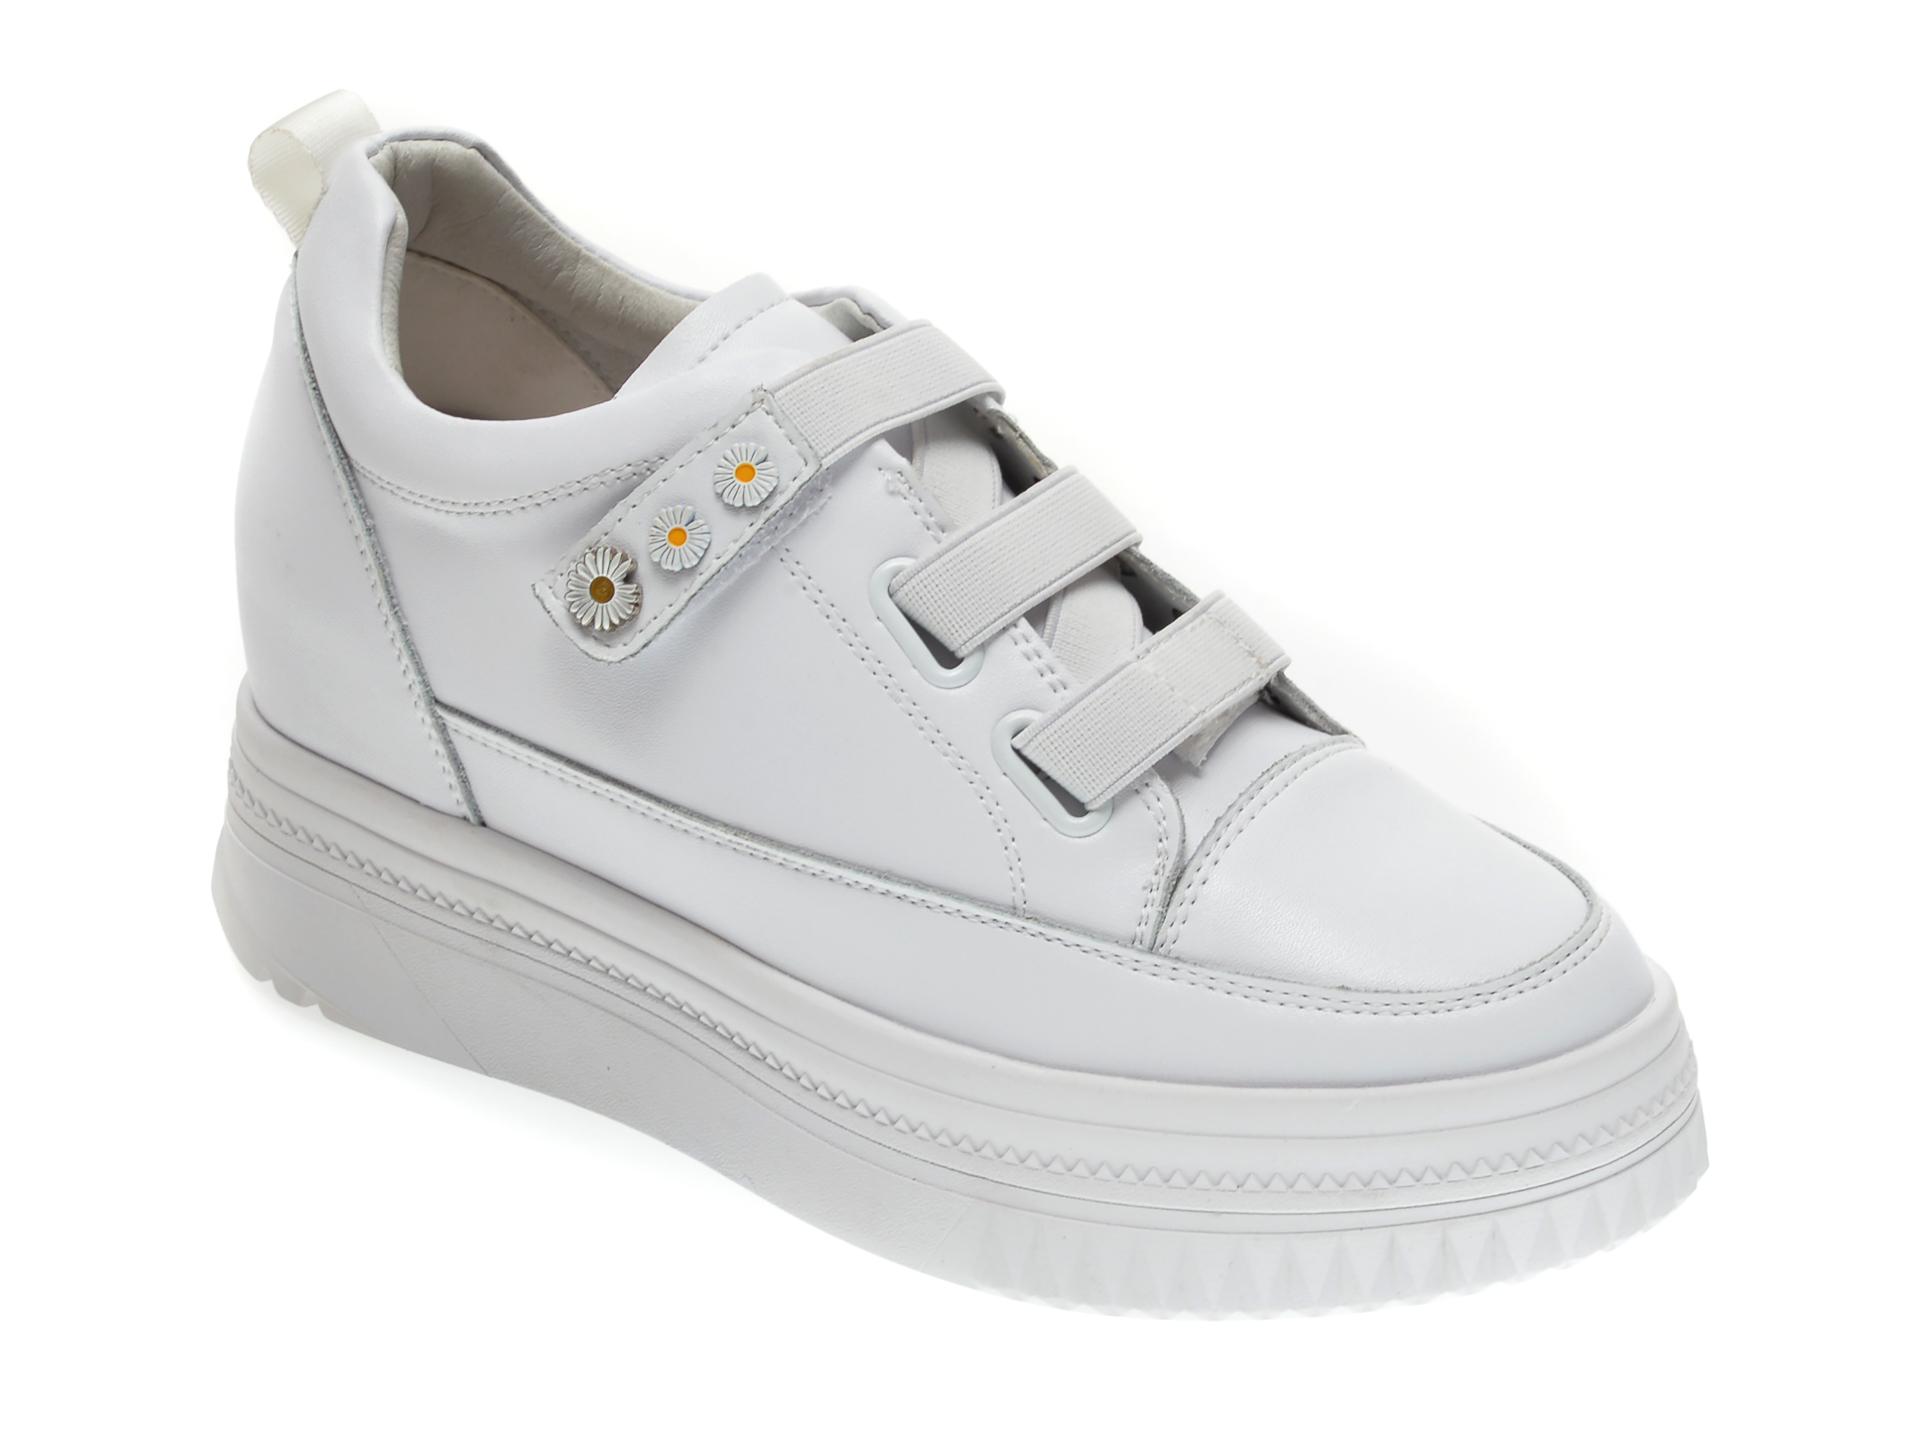 Pantofi GRYXX albi, Q5018, din piele naturala imagine